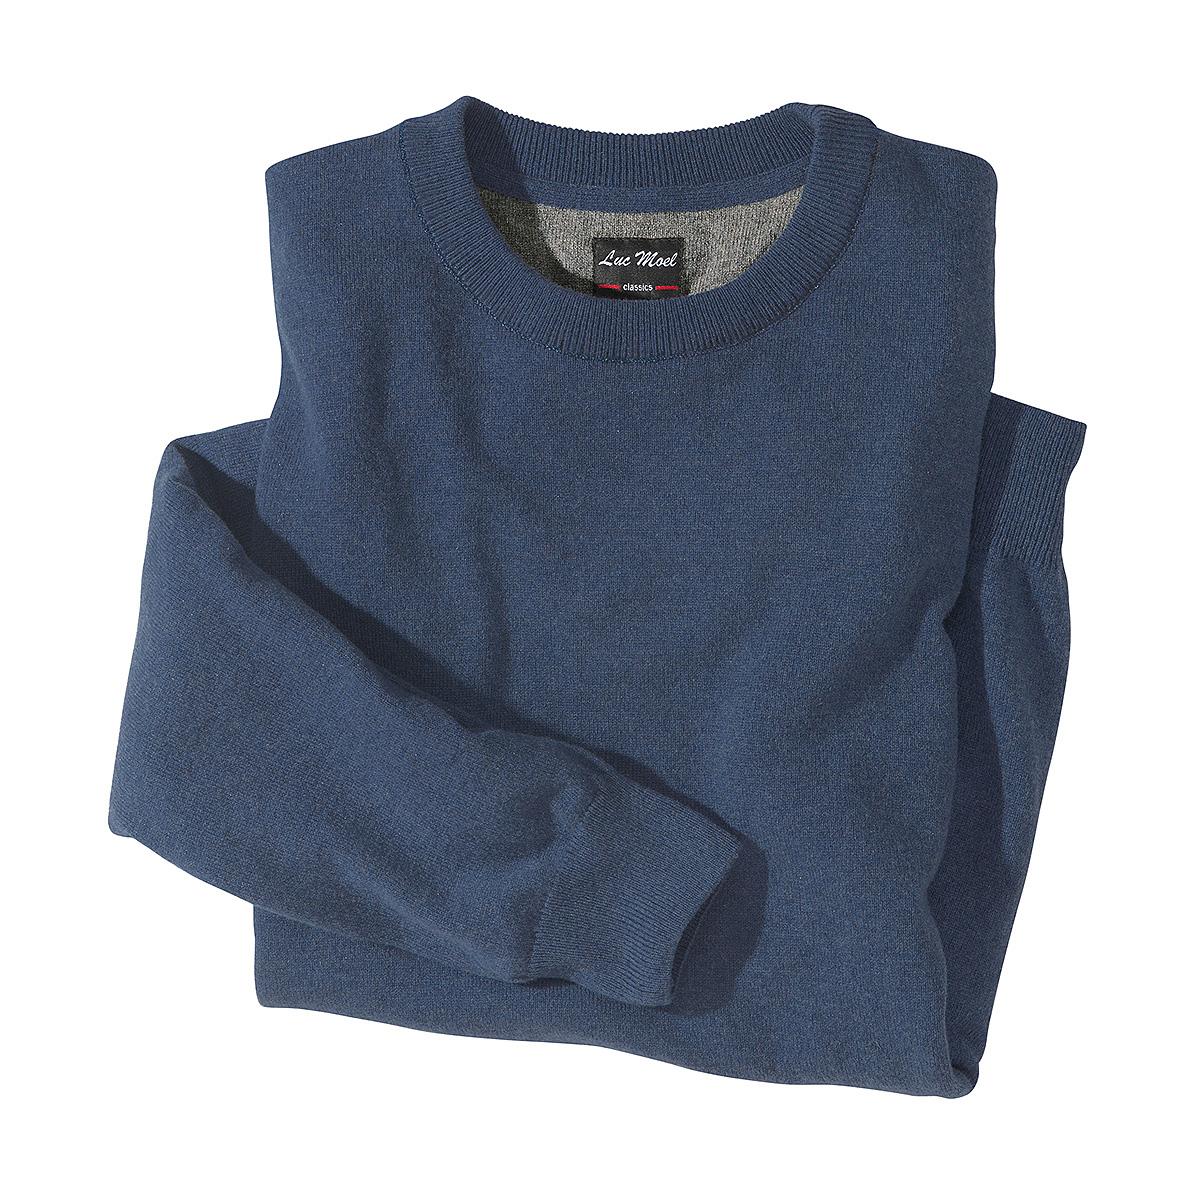 luc moel kaschmir pullover farbe blau gr enspezialist m nnermode. Black Bedroom Furniture Sets. Home Design Ideas